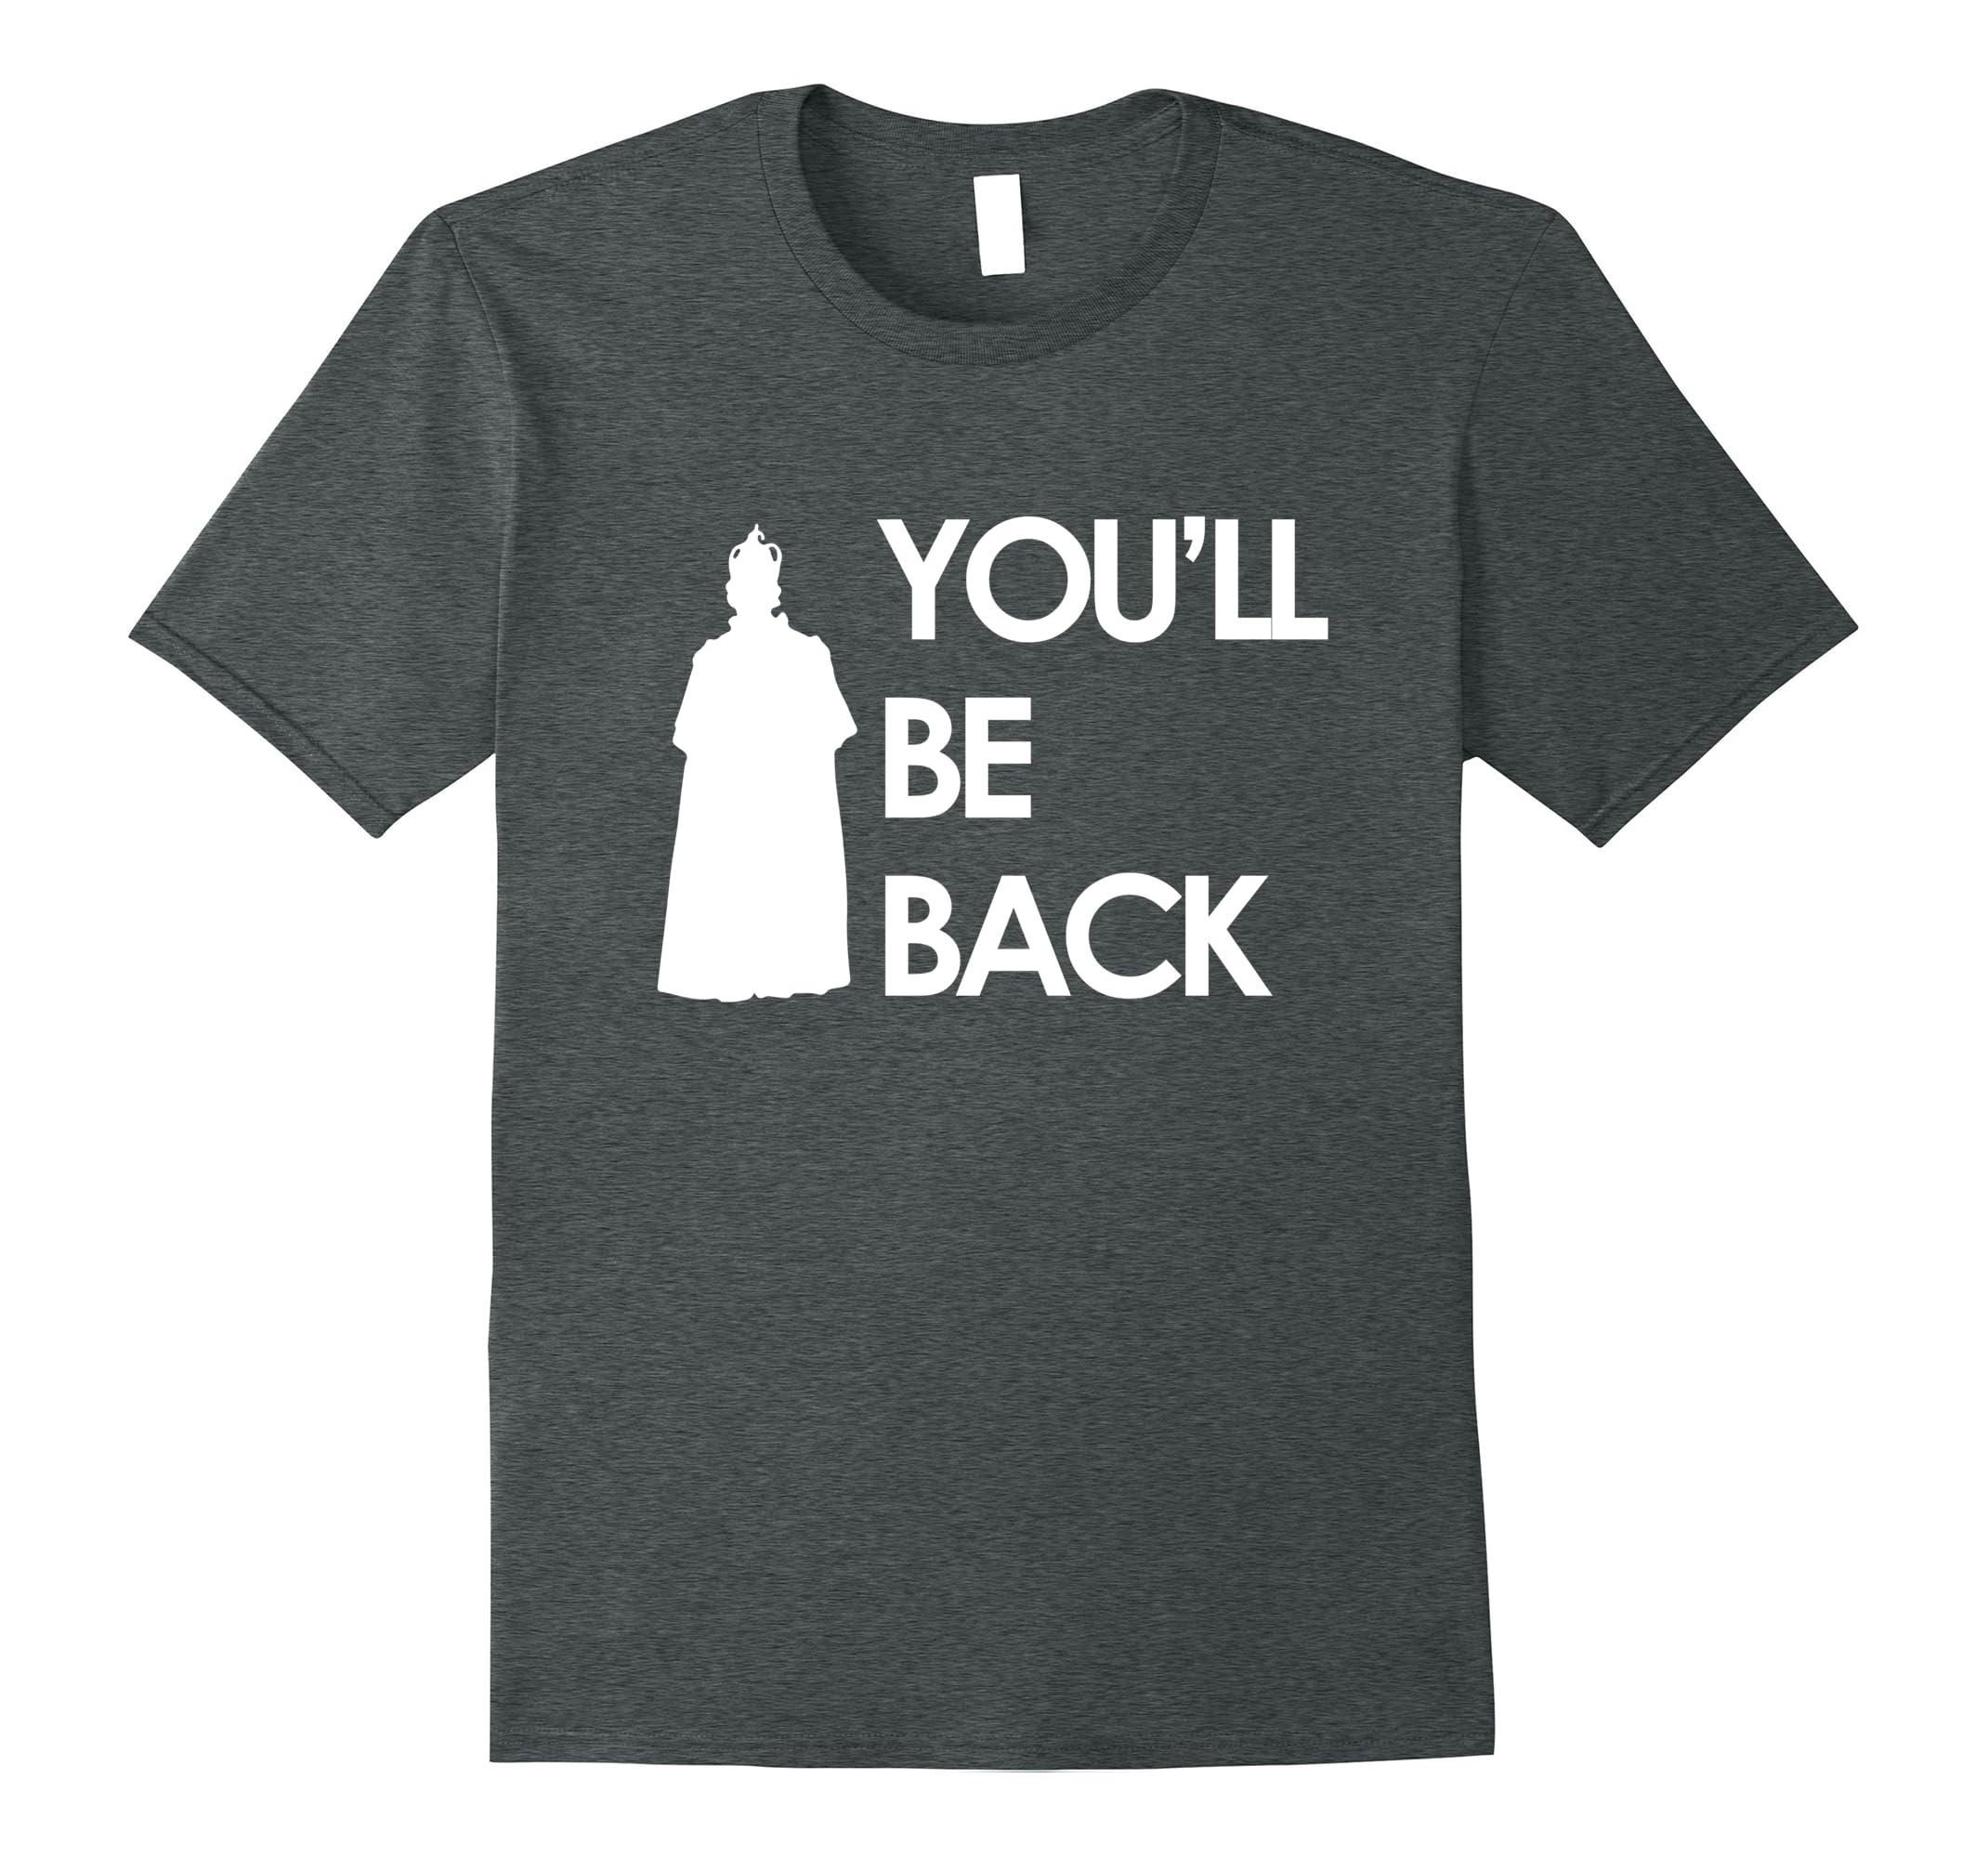 50b2dc101 King George You ll Be Back Shirt Funny Tee-ah my shirt one gift ...